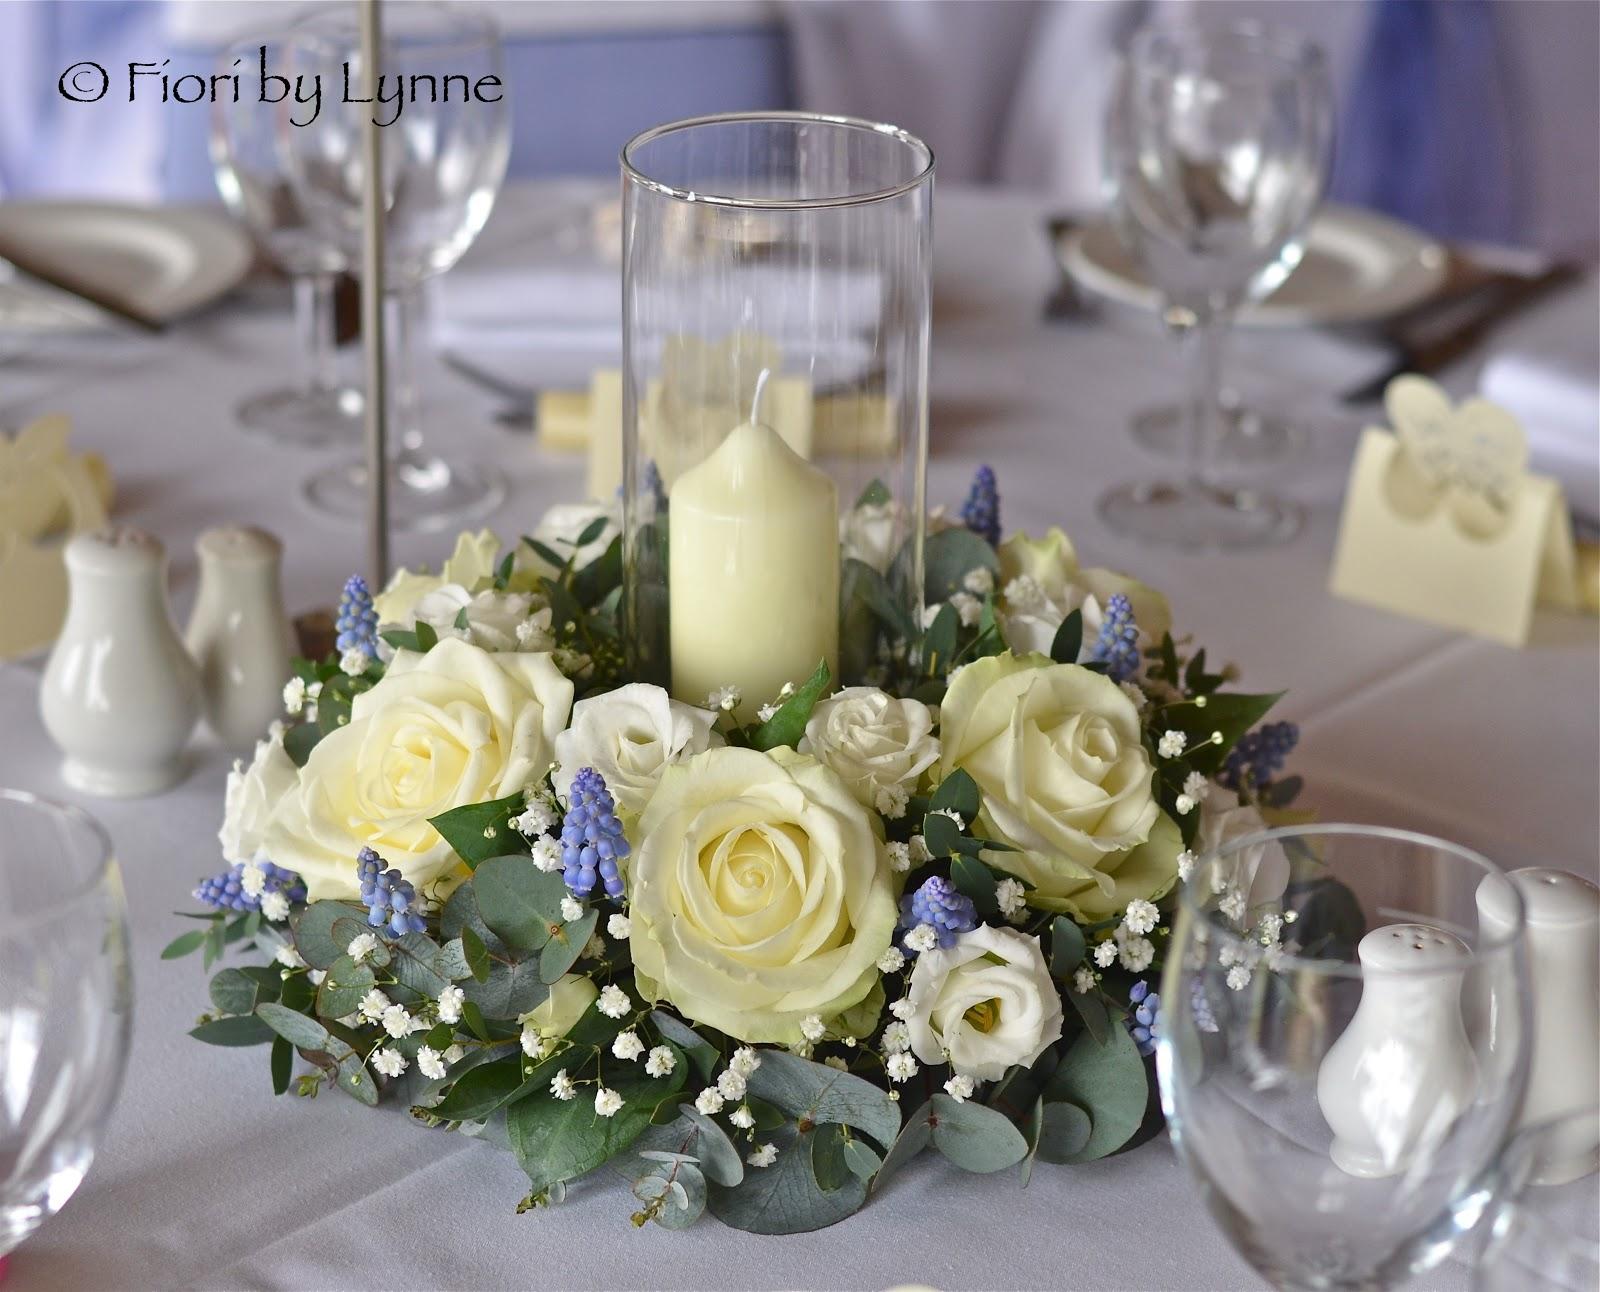 Wedding flowers blog carmens blue and white spring wedding flowers wedding flowers blog carmens blue and white spring wedding flowers marwell hotel mightylinksfo